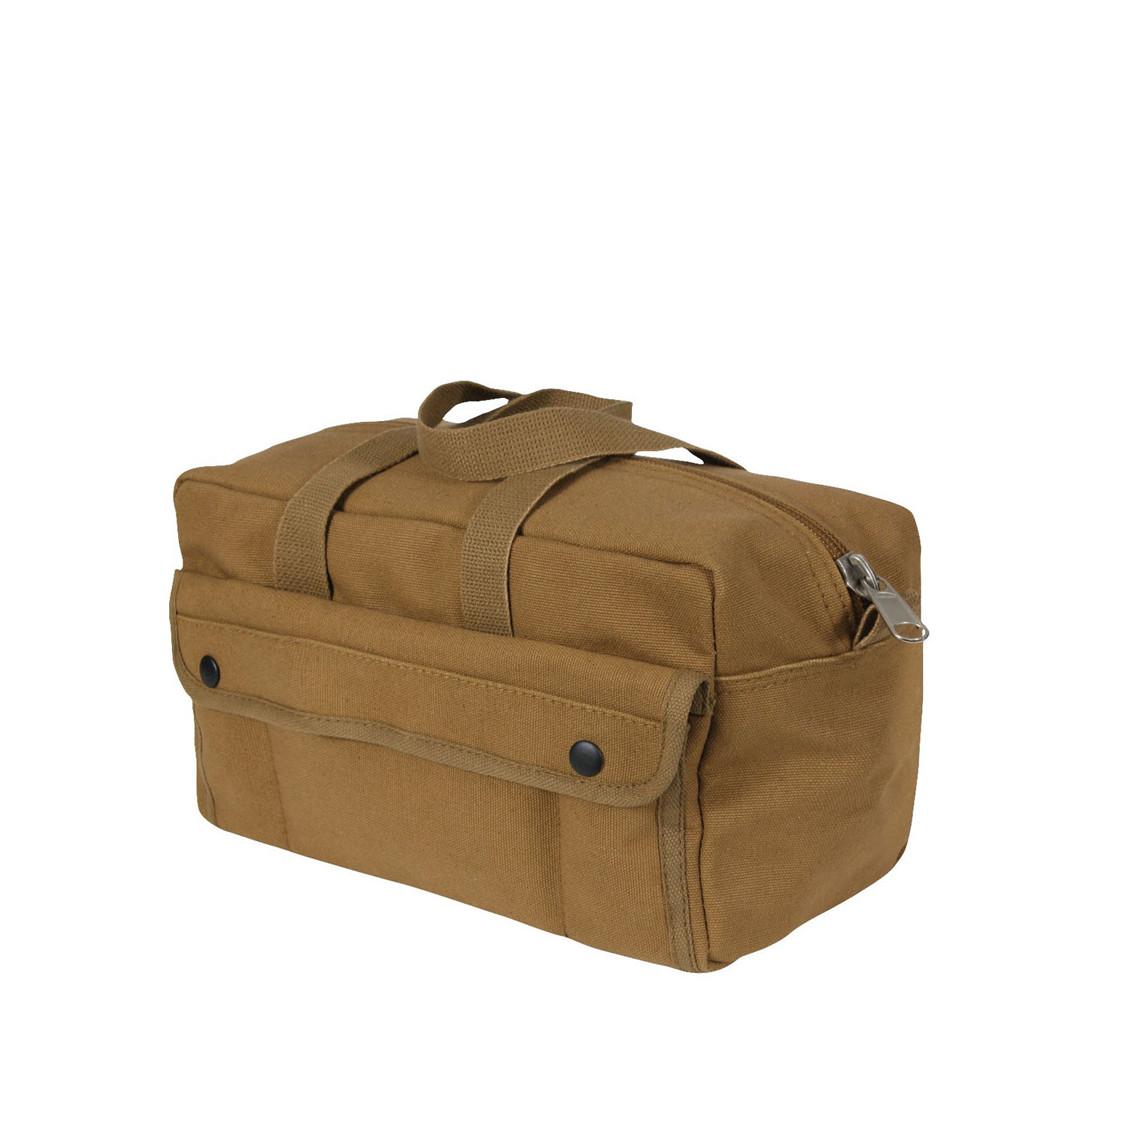 Shop Coyote Mechanics Tool Bags - Fatigues Army Navy Gear 1d0dd625f404c